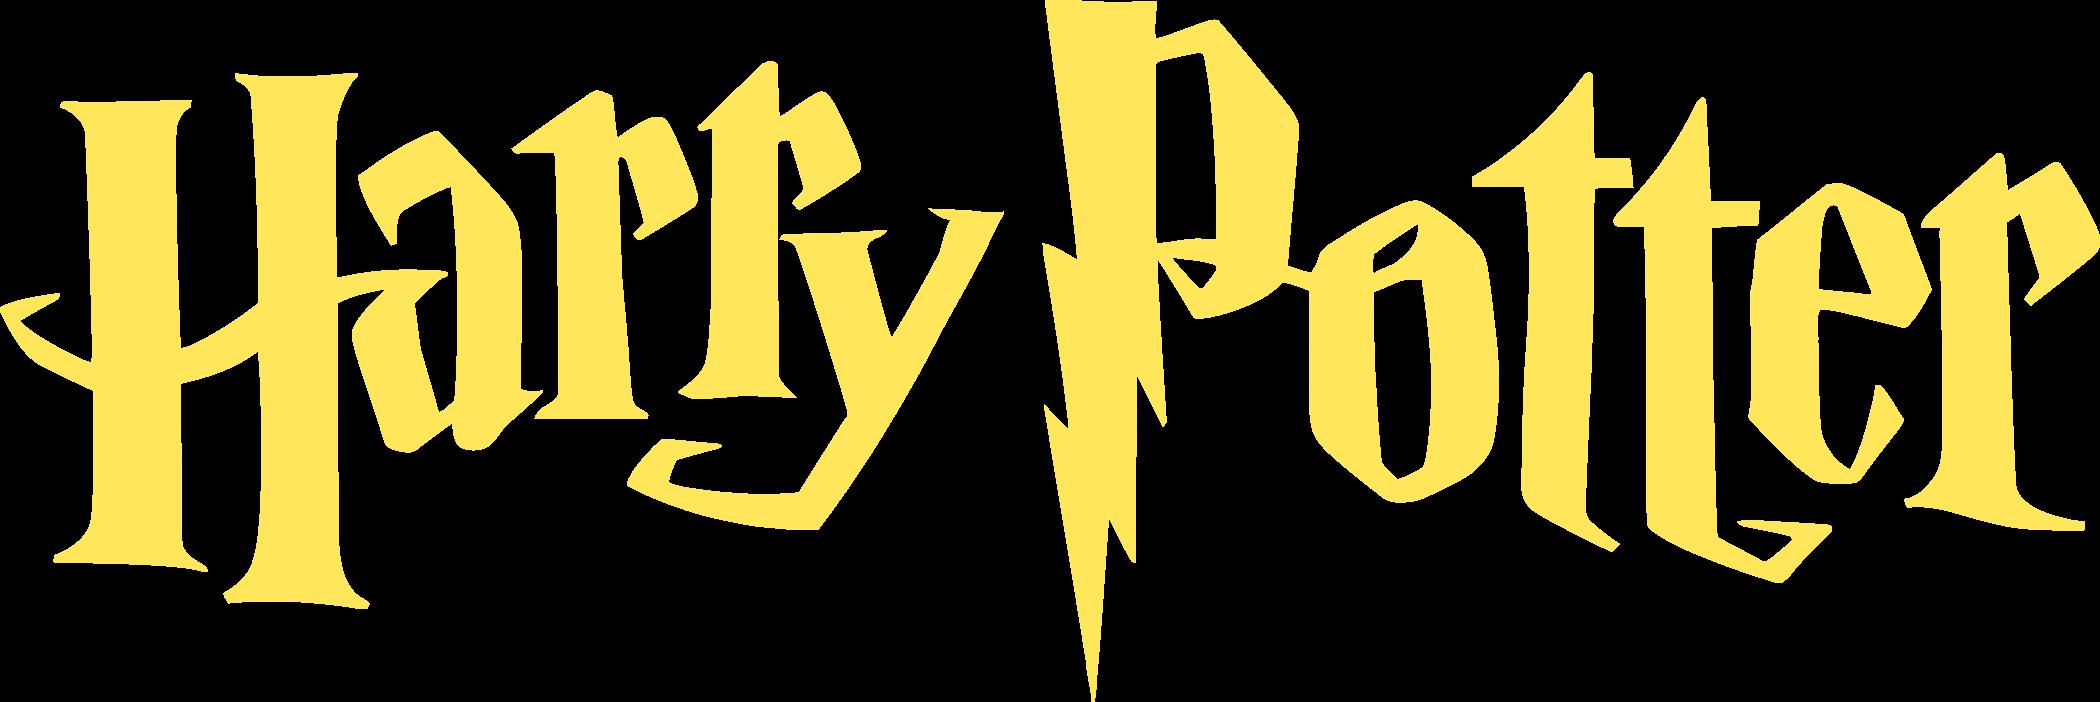 Harry Potter Logo.